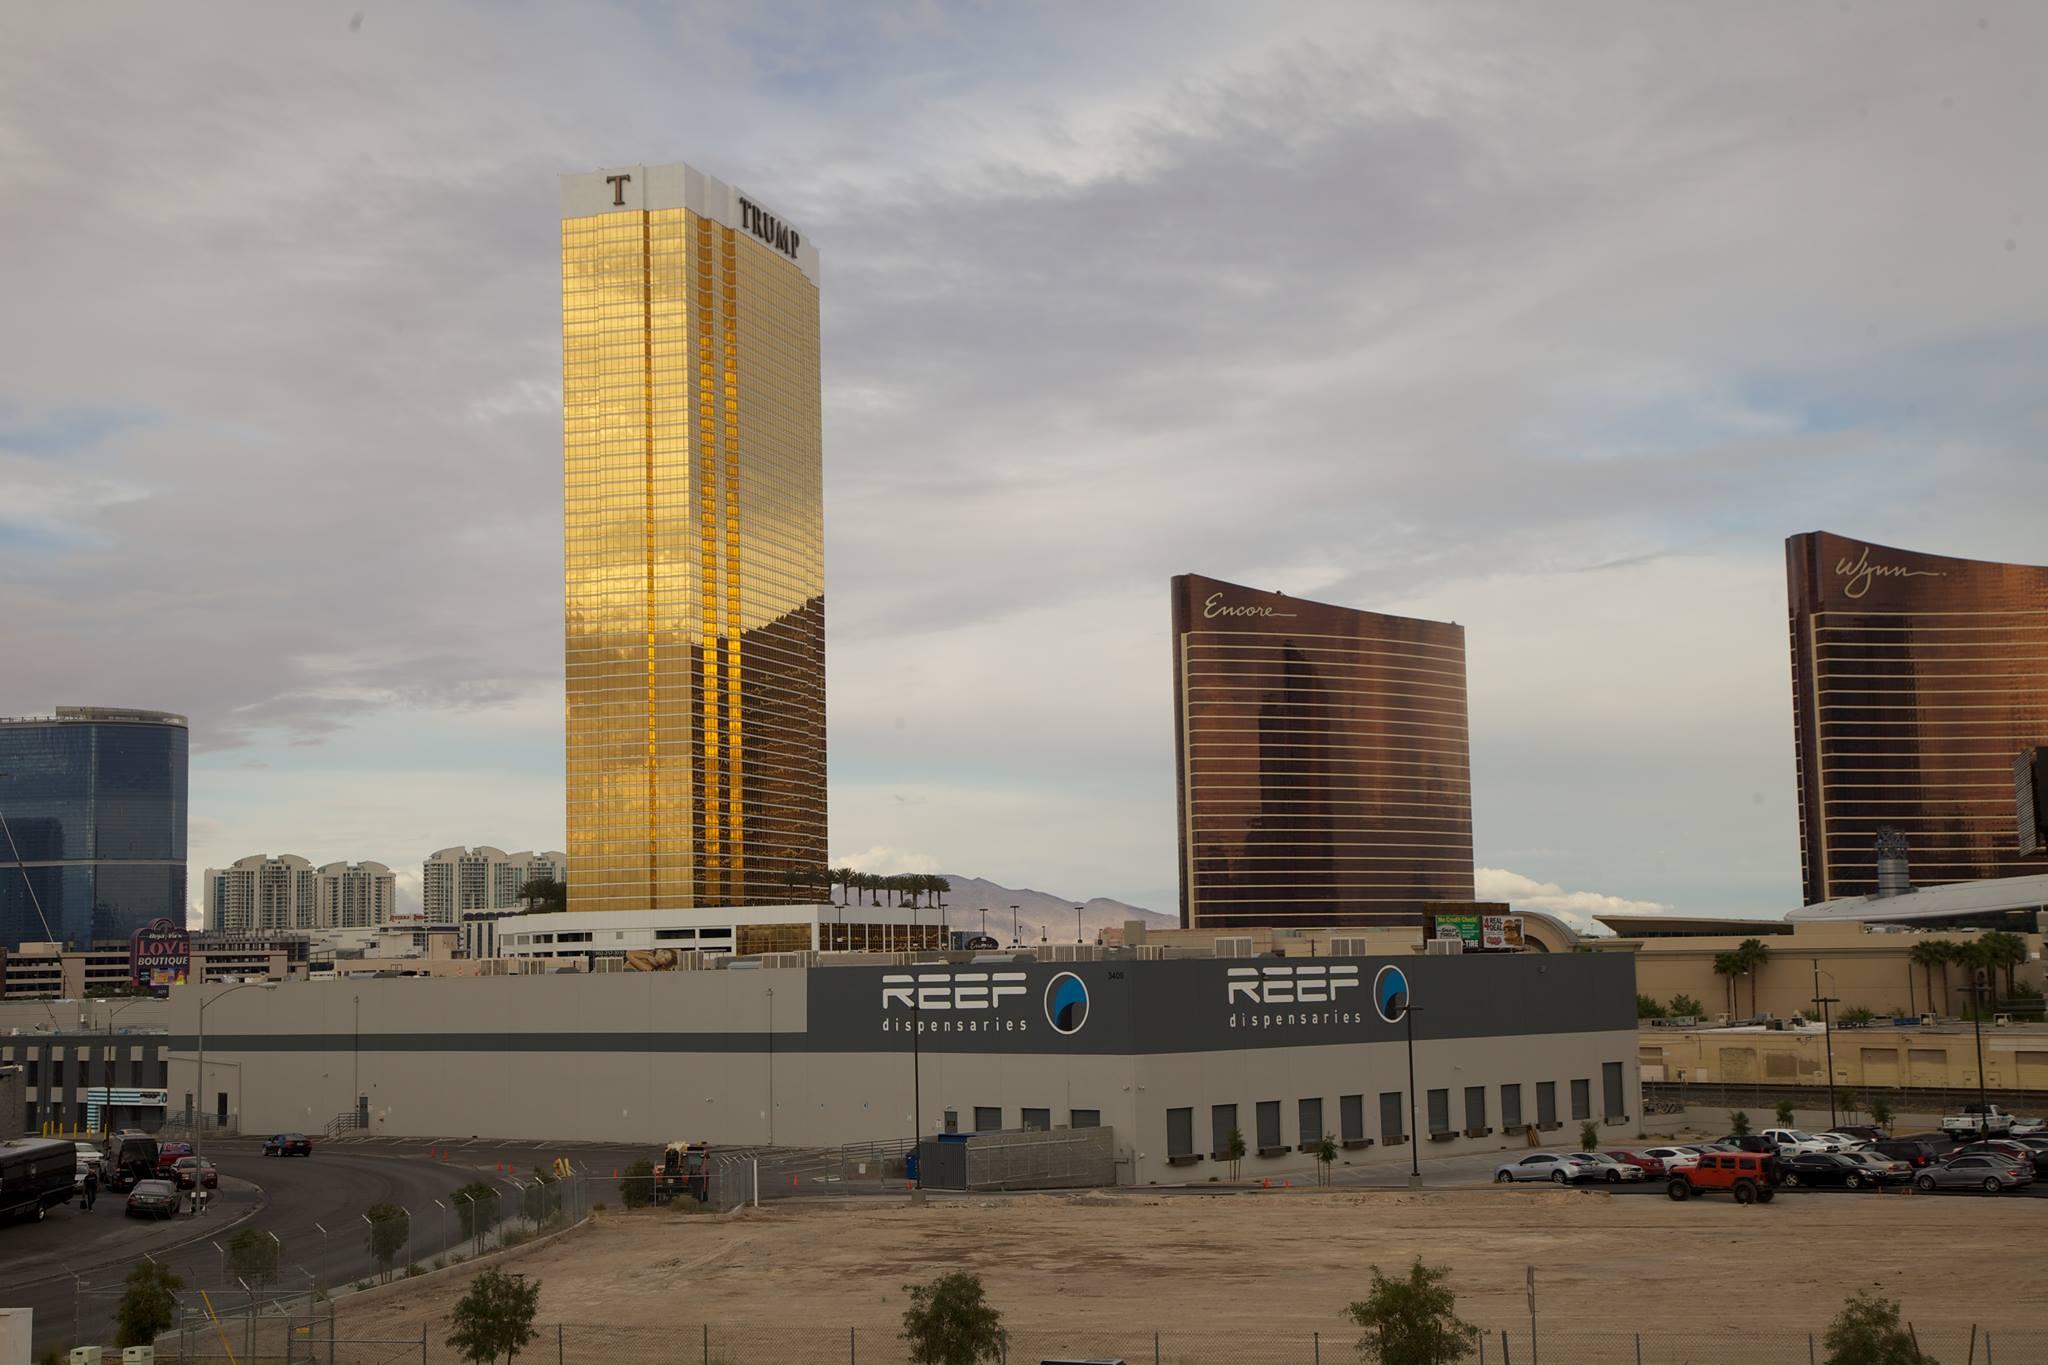 Reef Dispensaies - Las Vegas medical marijuana dispensary in Las Vegas, Nevada